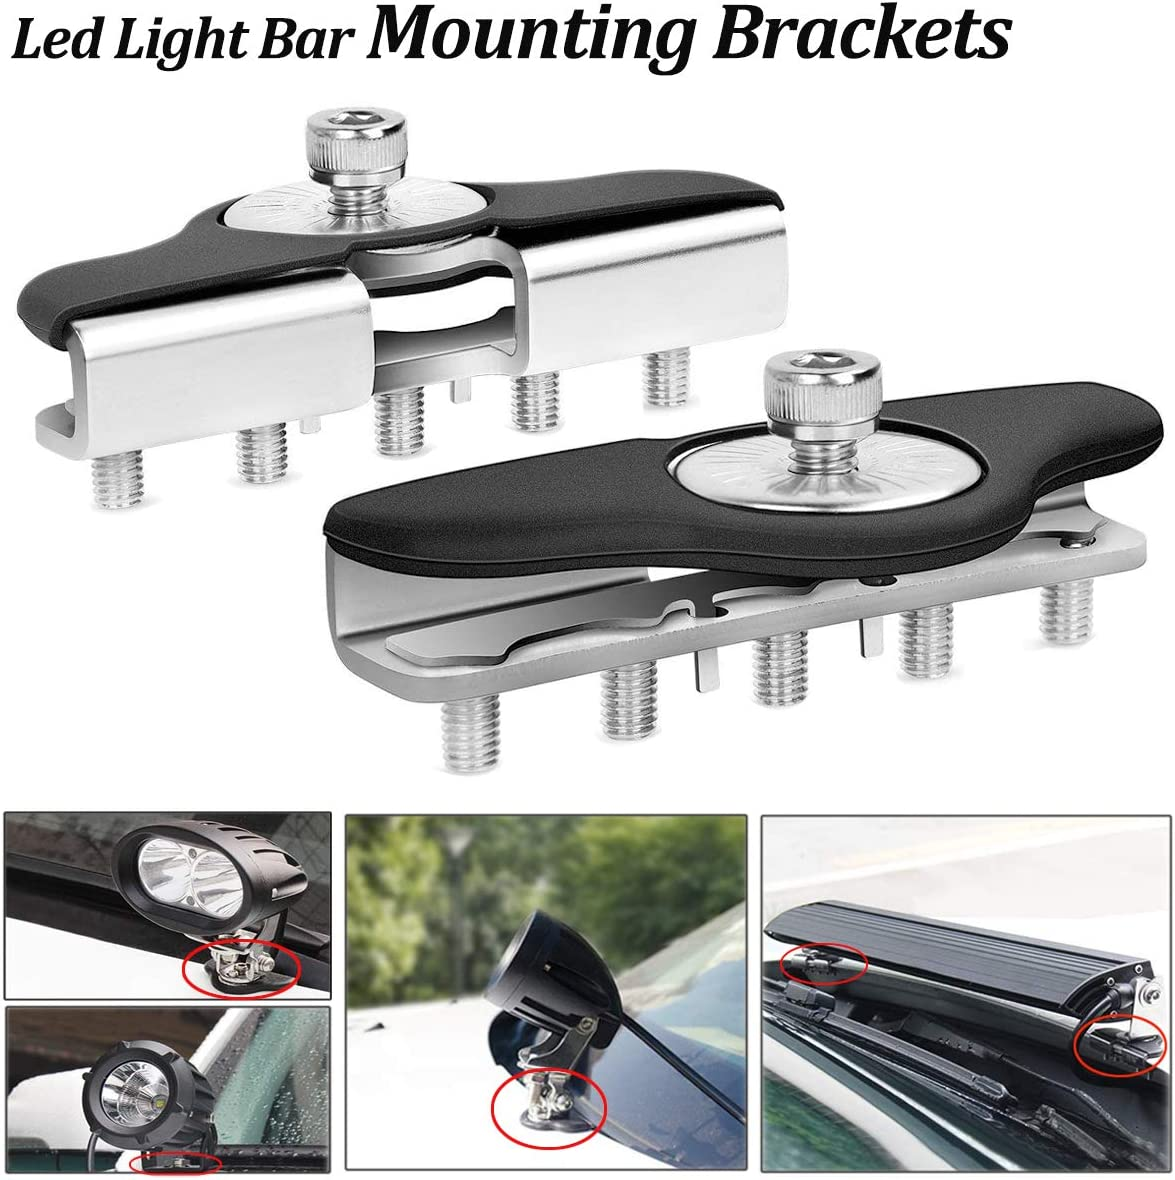 LEDMIRCY Led Light Bar Mounting Universal Brackets 2PCS trend rank Adjustab Cheap mail order shopping